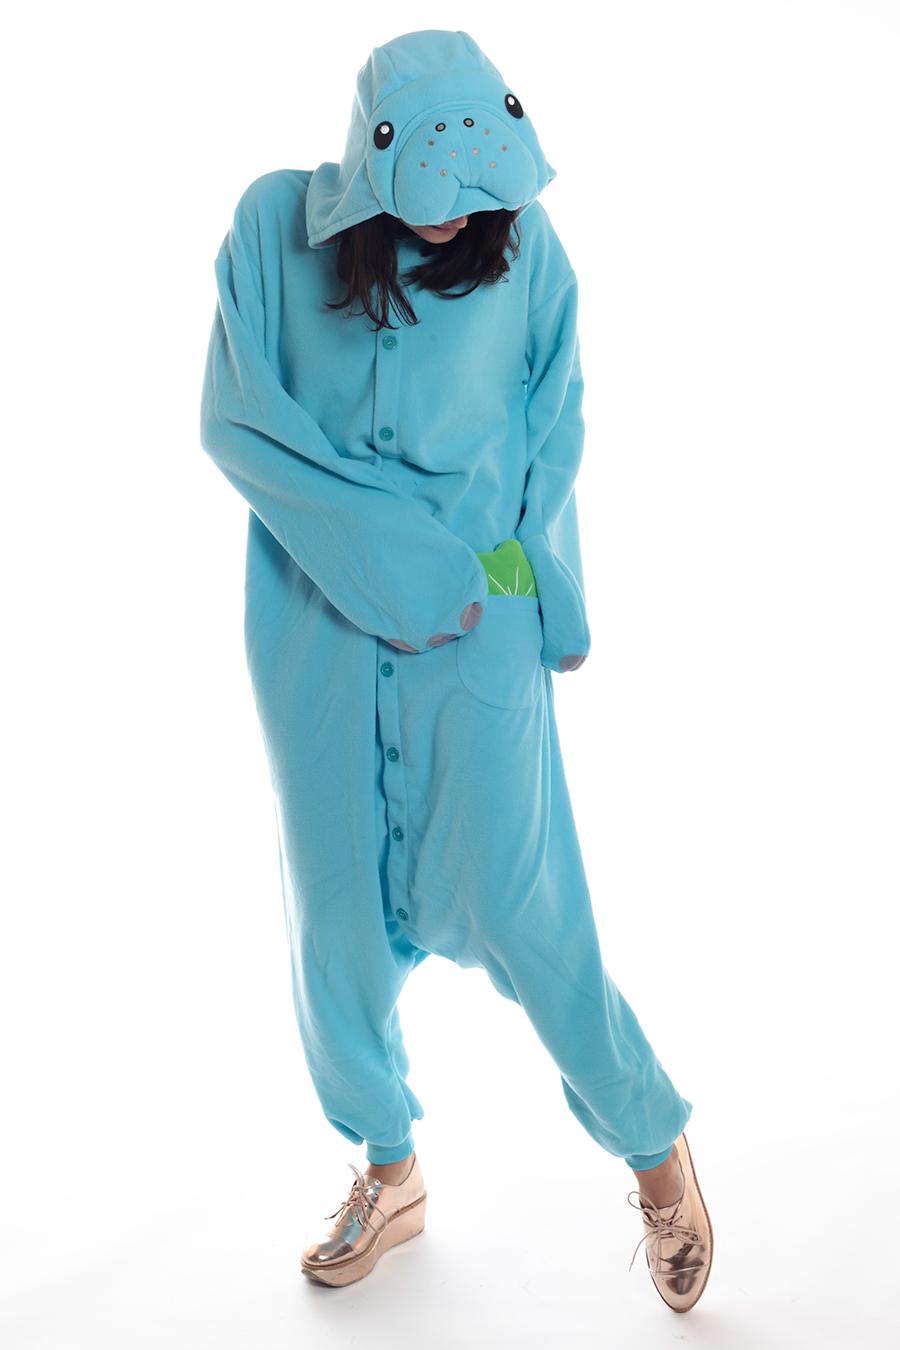 c50ba83056 Manatee Adult Animal Kigurumi Onesie Costume Pajamas